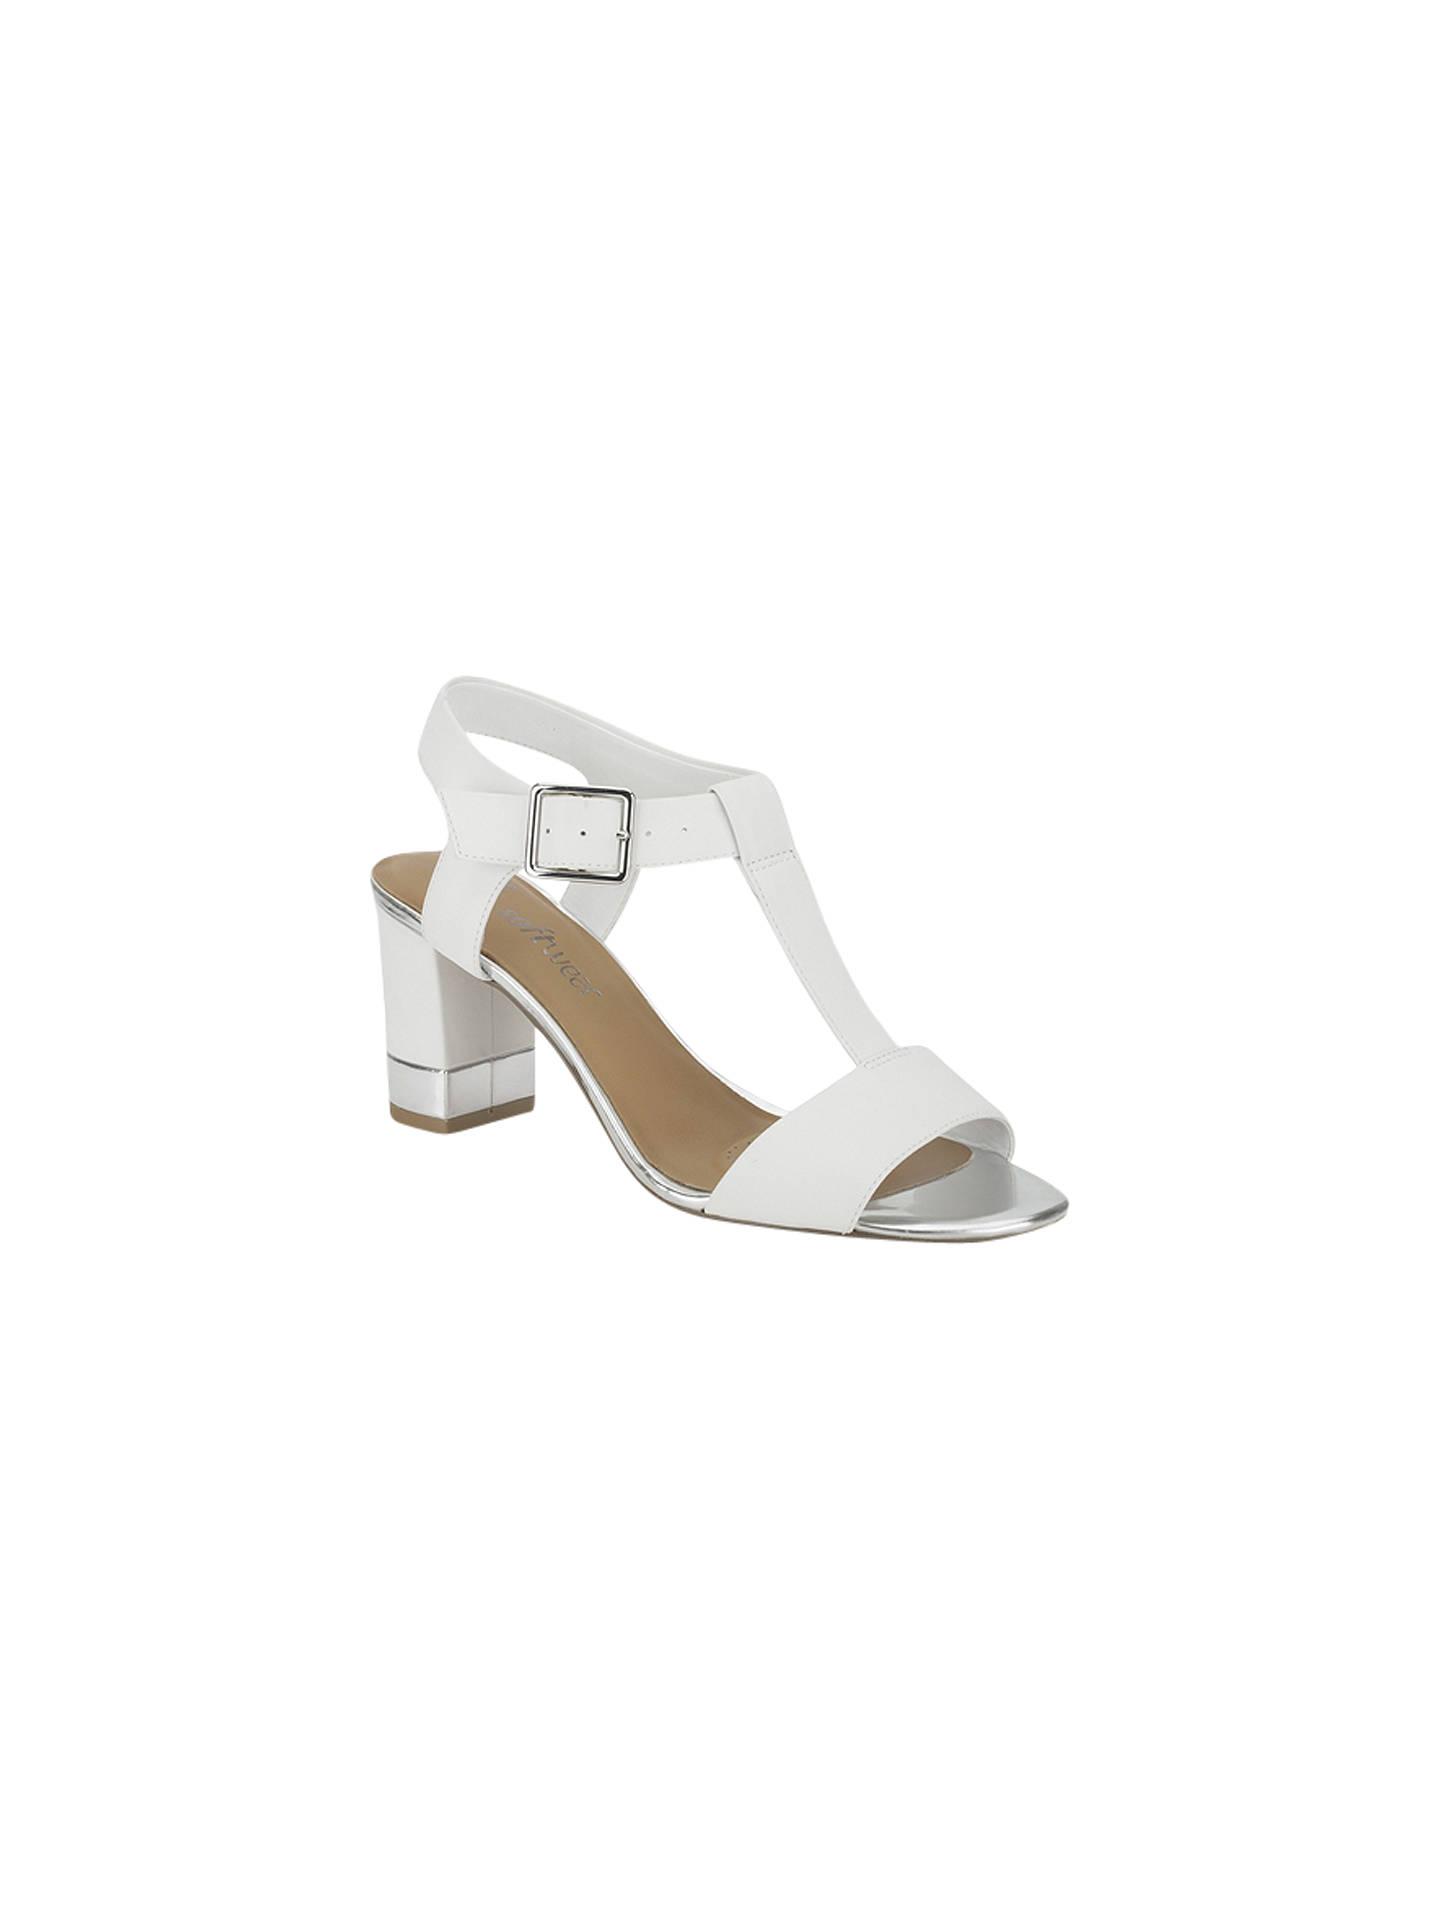 42e8921aee3c Buy Clarks Smart Deva Leather Sandals